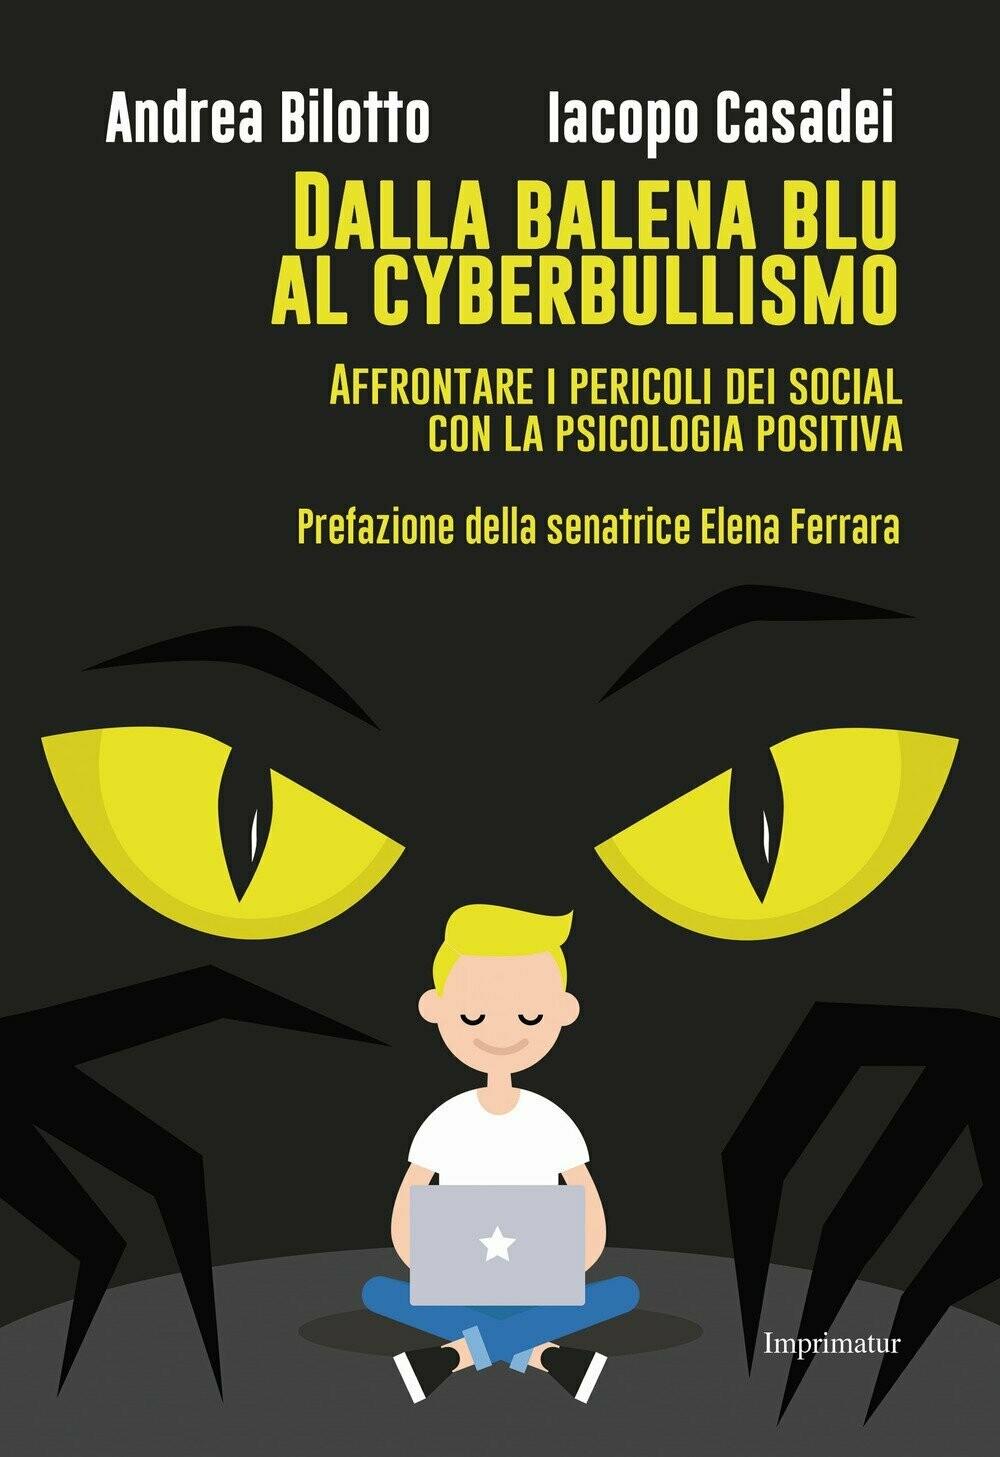 Dalla balena blu al cyberbullismo